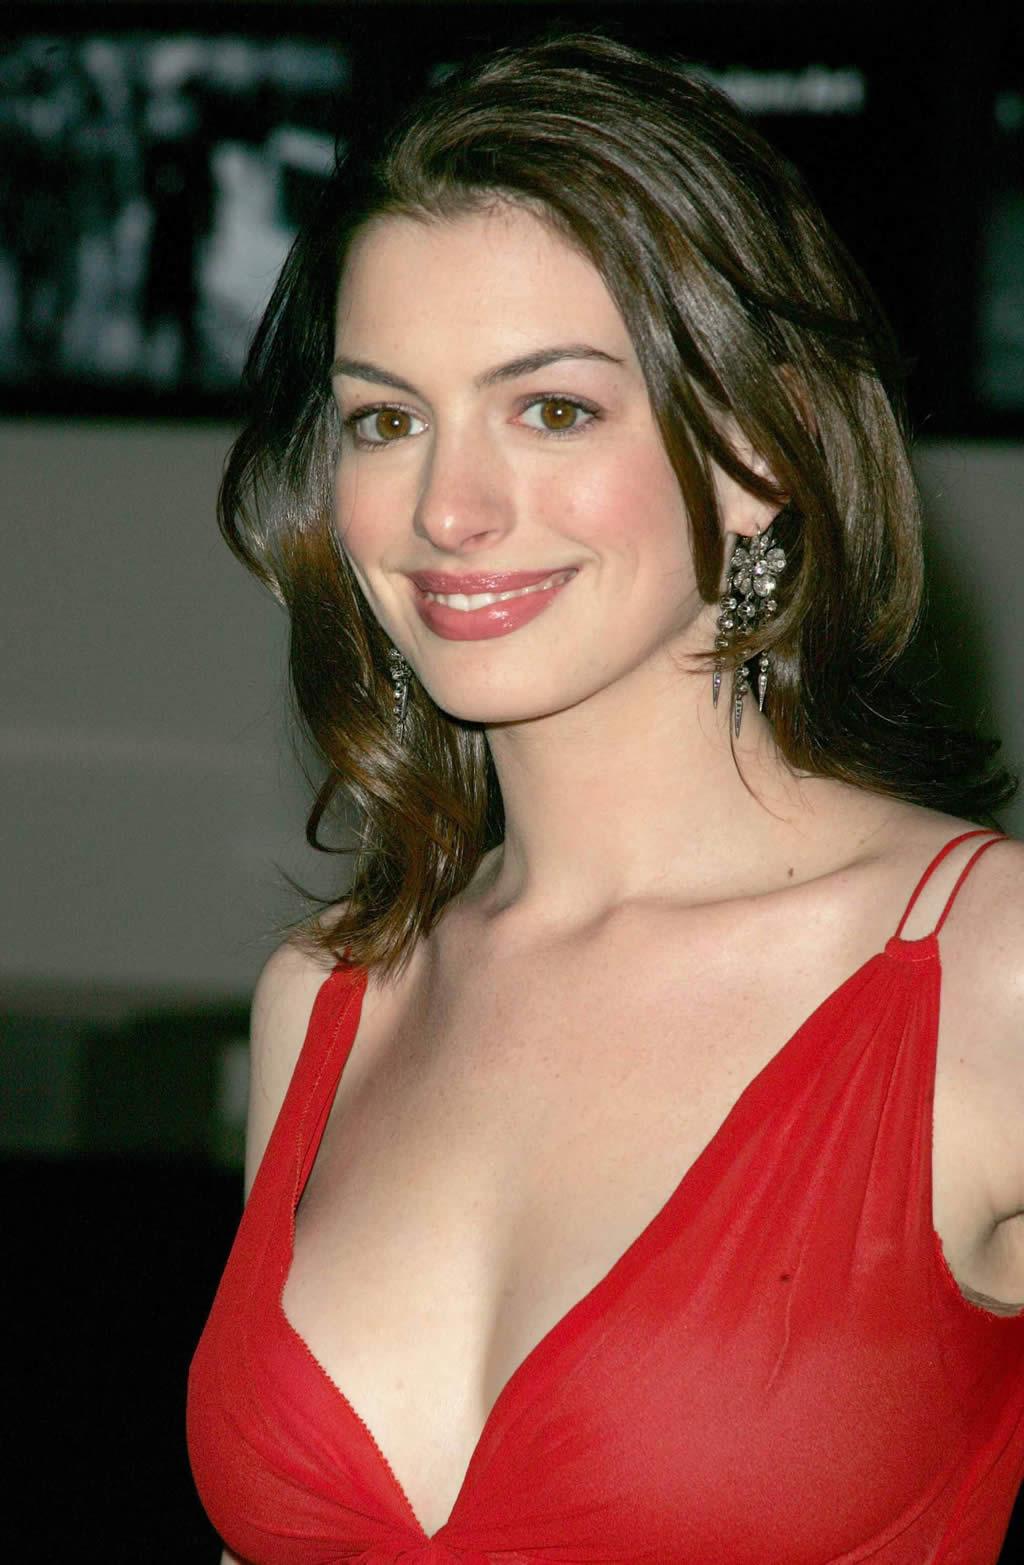 http://3.bp.blogspot.com/-5PJoW8RlajU/TfExTwwvBwI/AAAAAAAADgc/EuYqMWdiXkA/s1600/images+of+hollywood+actresses.jpg